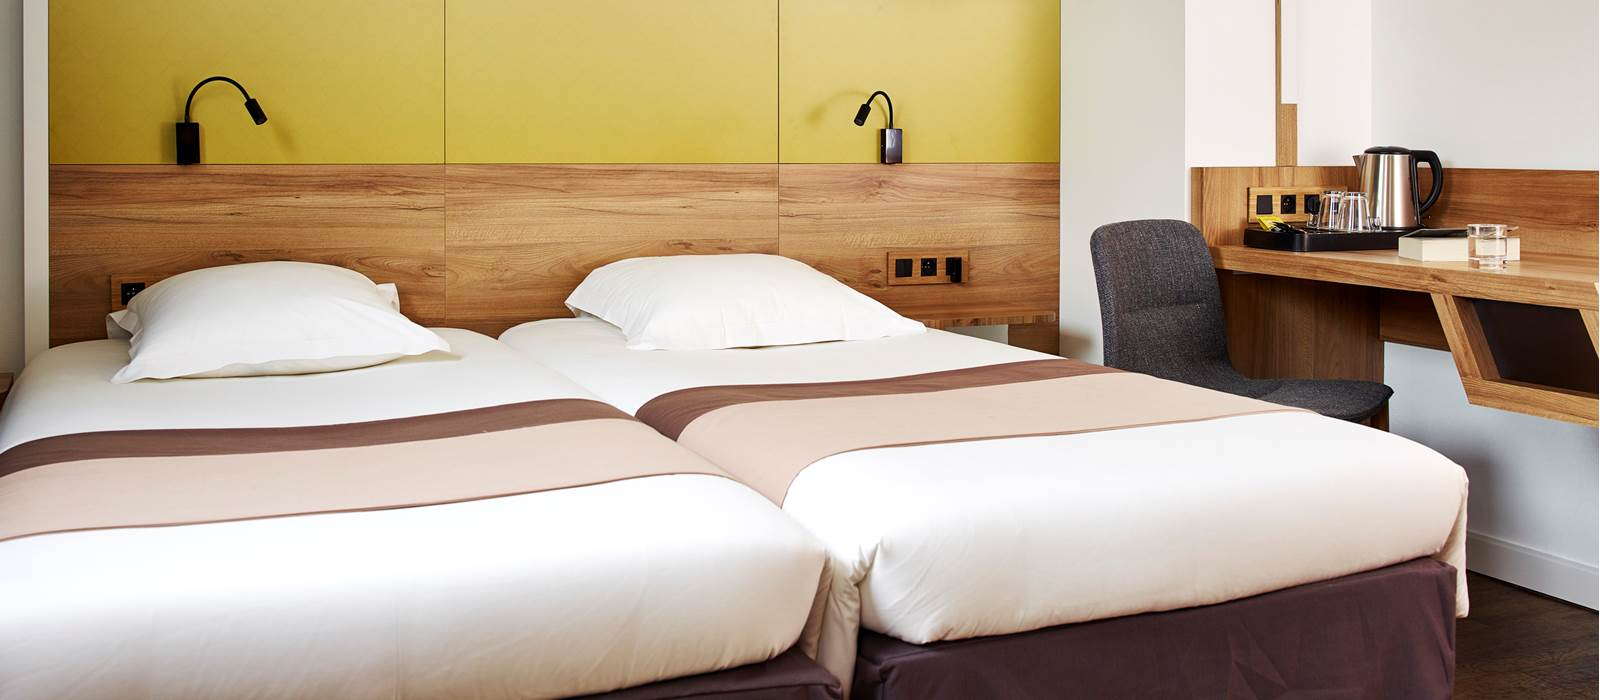 Services and facilities median paris porte de versailles - Hotel median paris porte de versailles ...